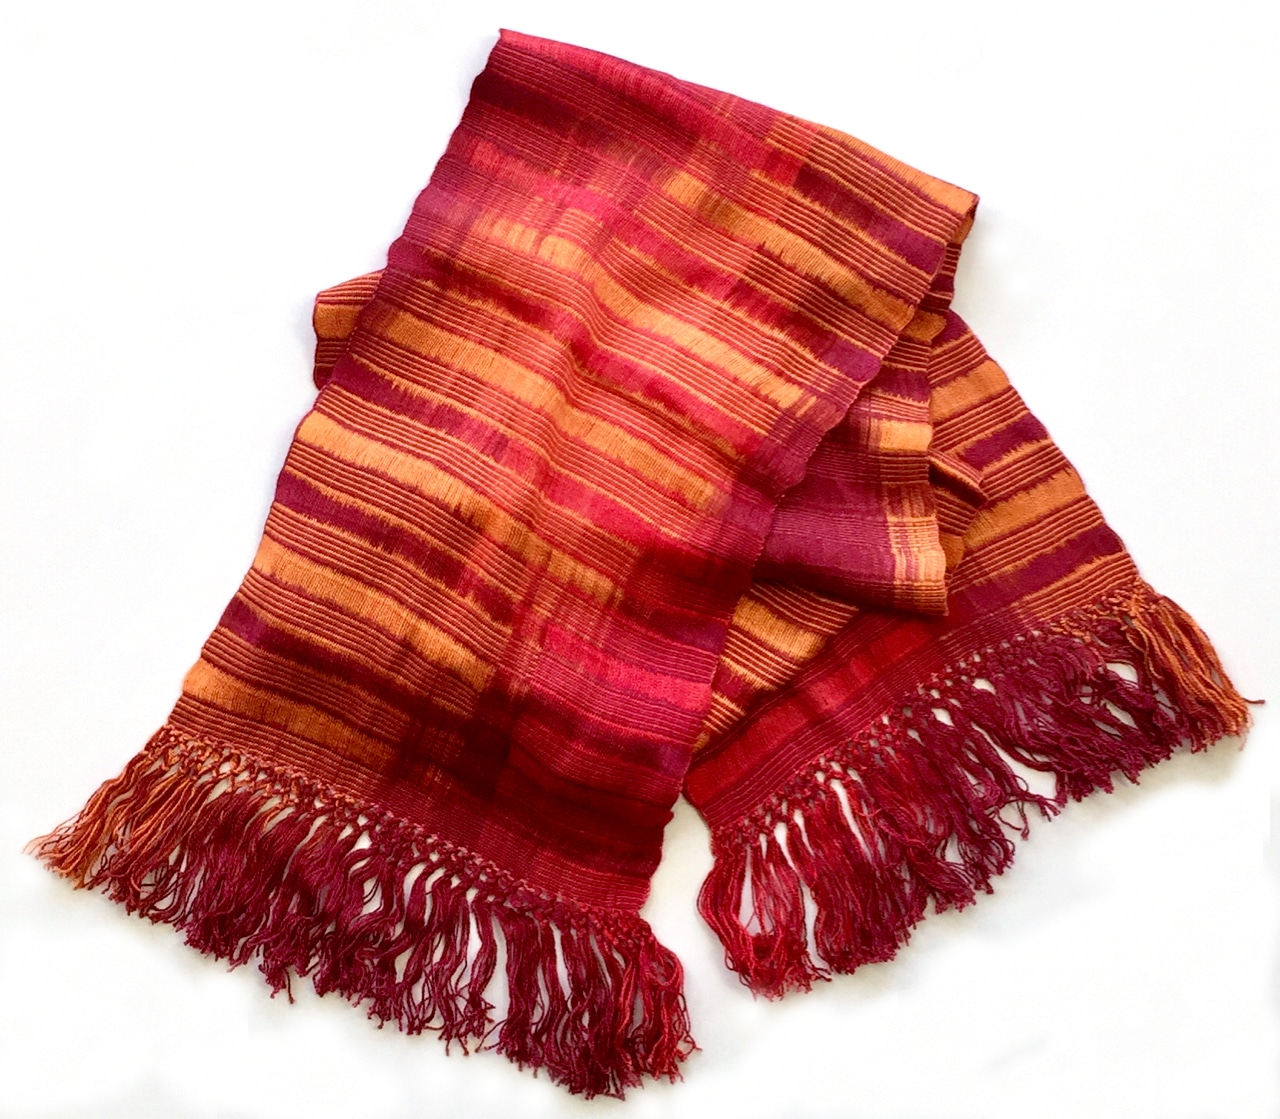 Red, Orange - Lightweight Bamboo Open-Weave Handwoven Scarf 8 x 68